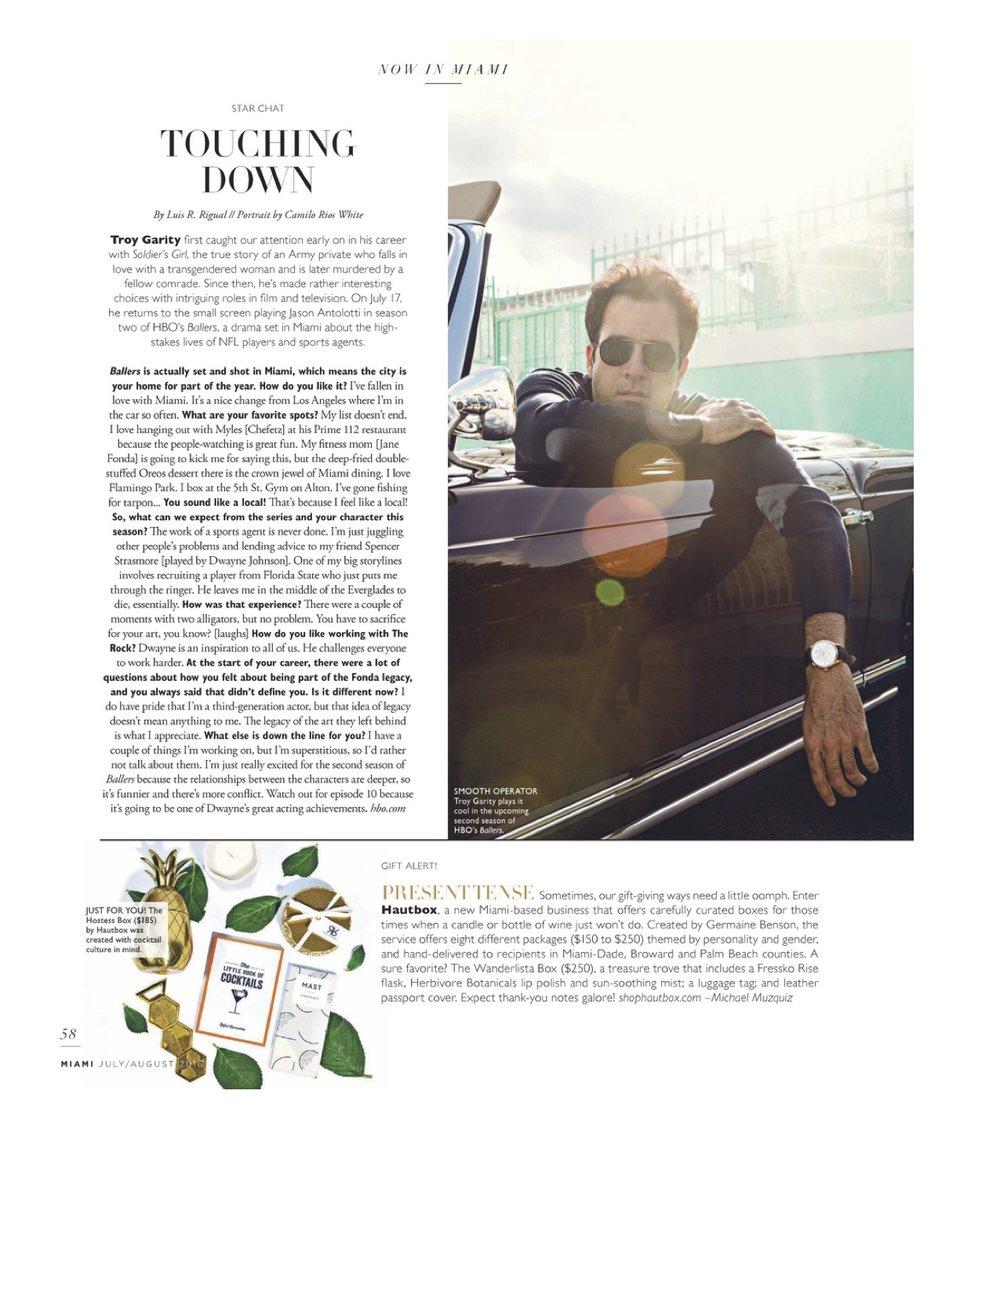 Hautbox-MIAMI Magazine July_August 2016.jpg